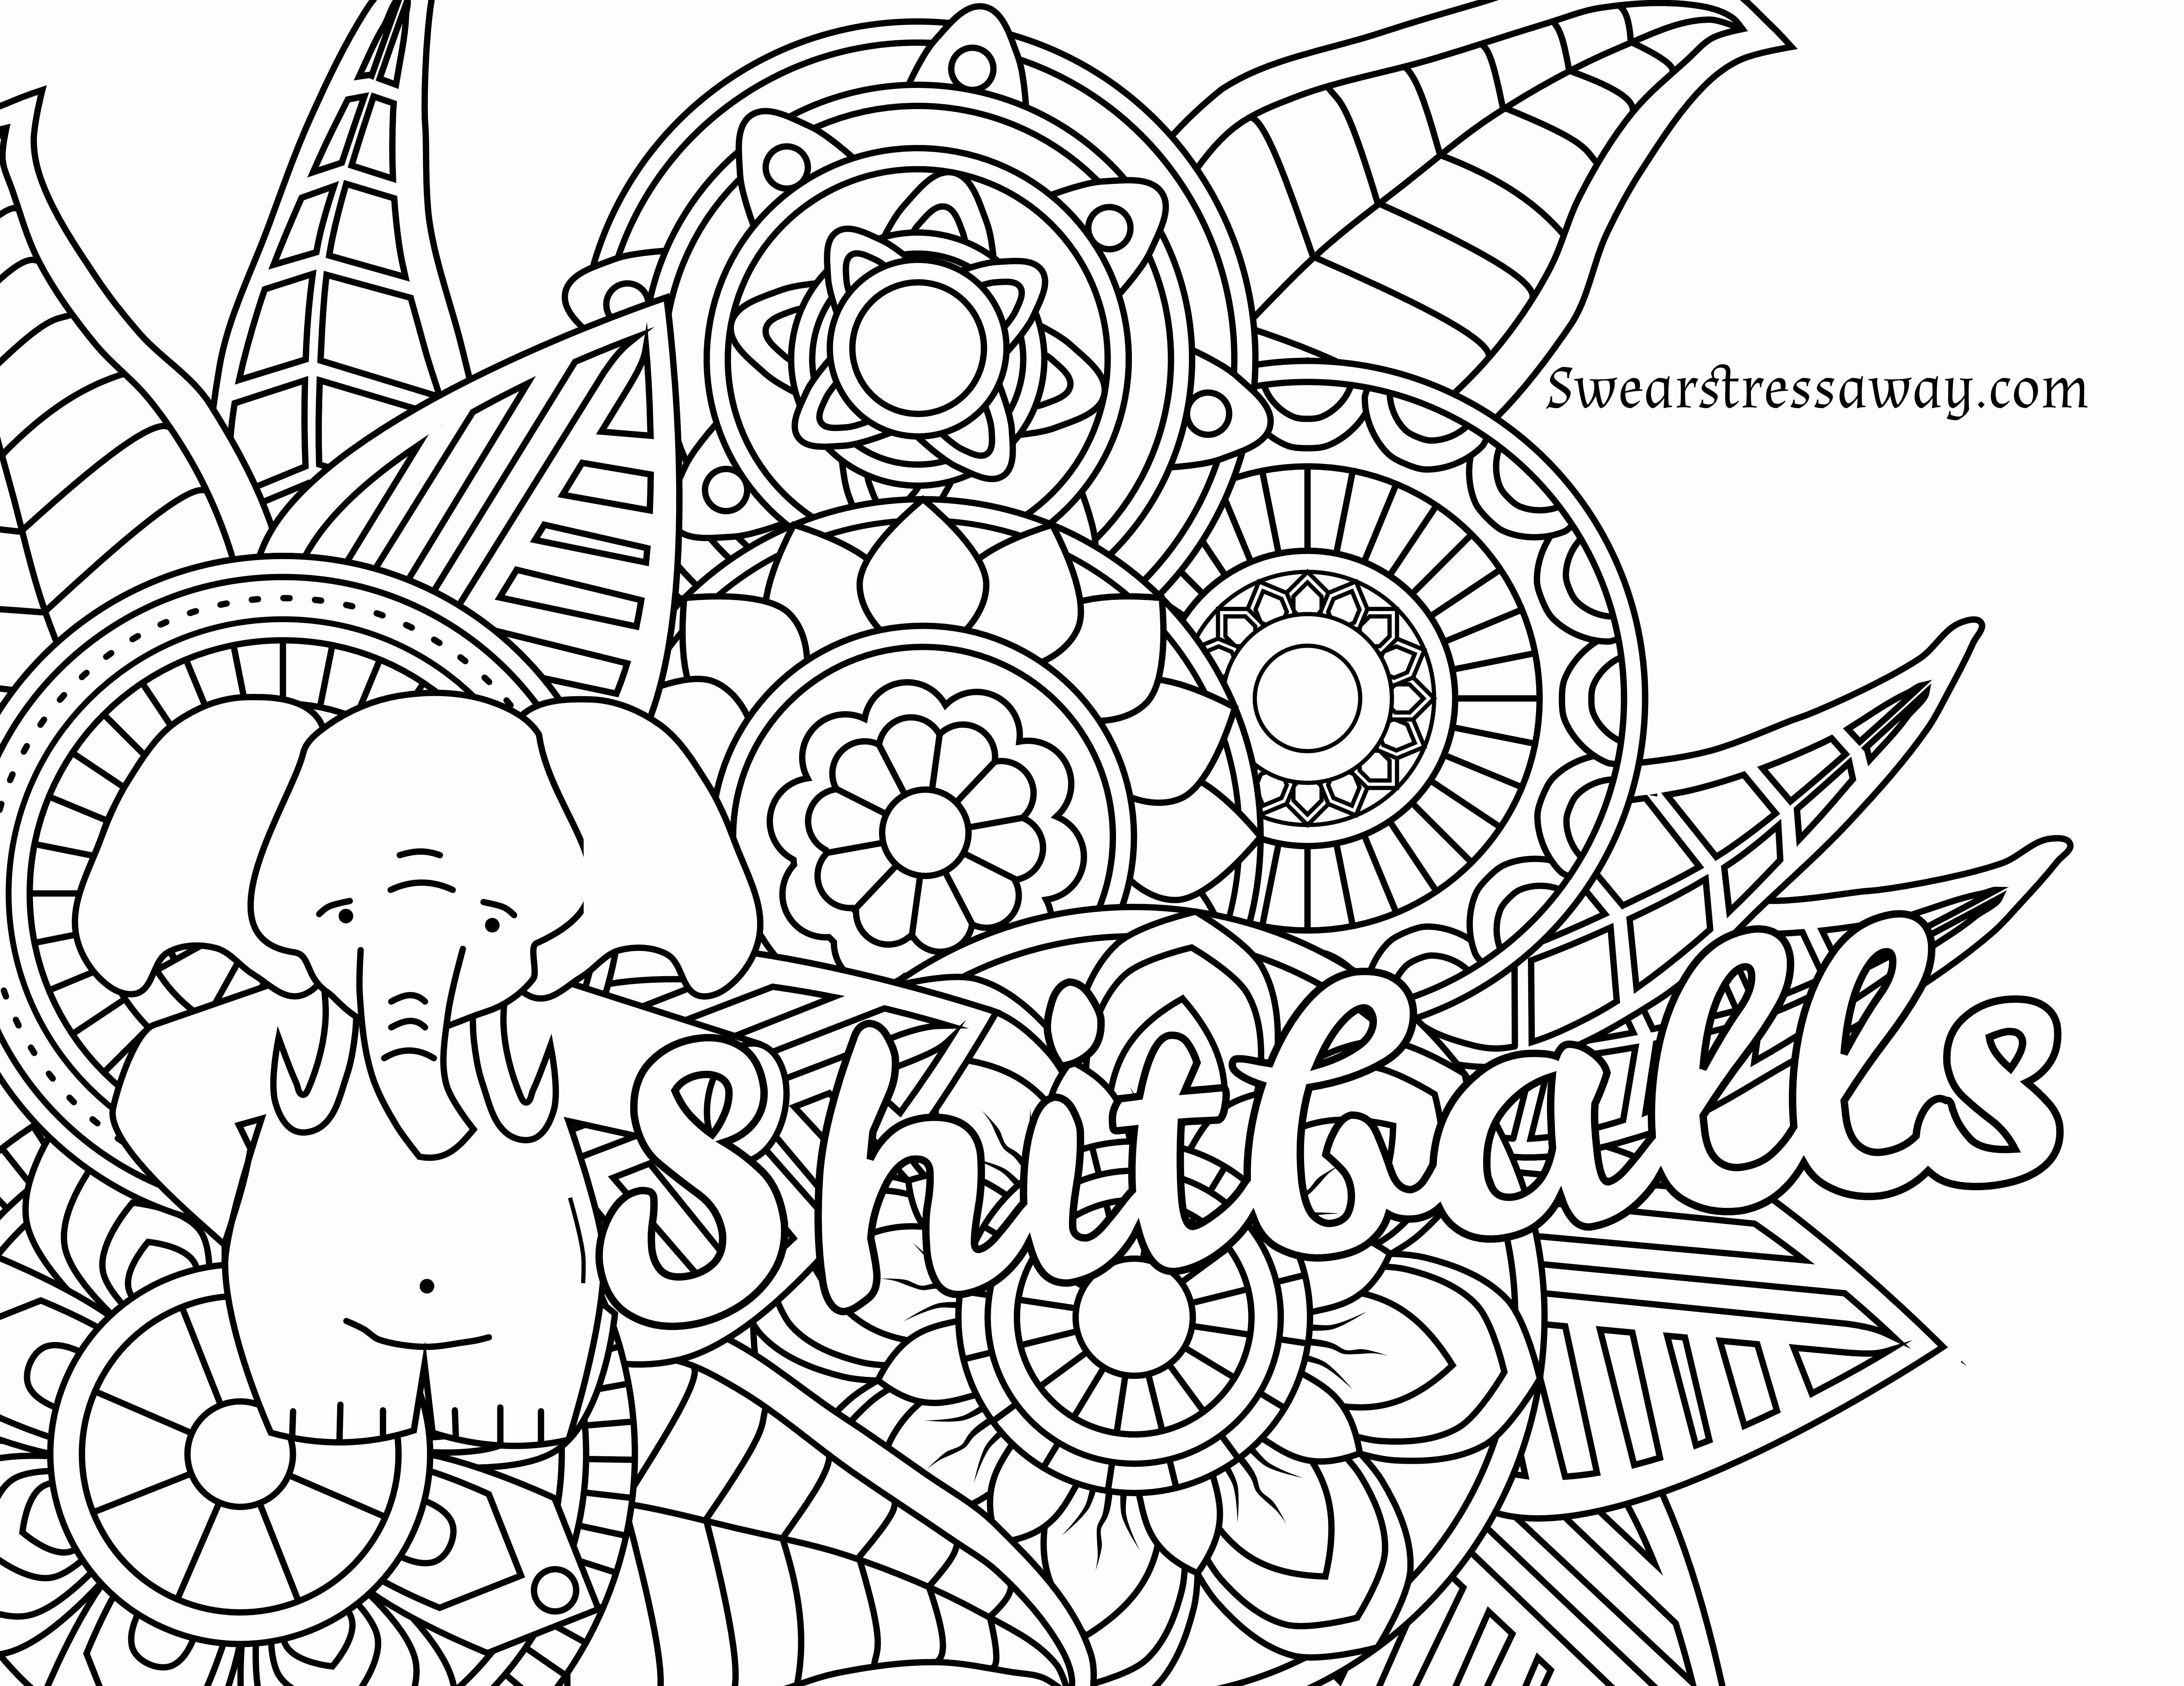 Coloring Activities For Adults Inspirational Collection Fun Easy Coloring Pages Sabadaphnecottage Buku Mewarnai Halaman Mewarnai Bunga Halaman Mewarnai [ 5328 x 6900 Pixel ]